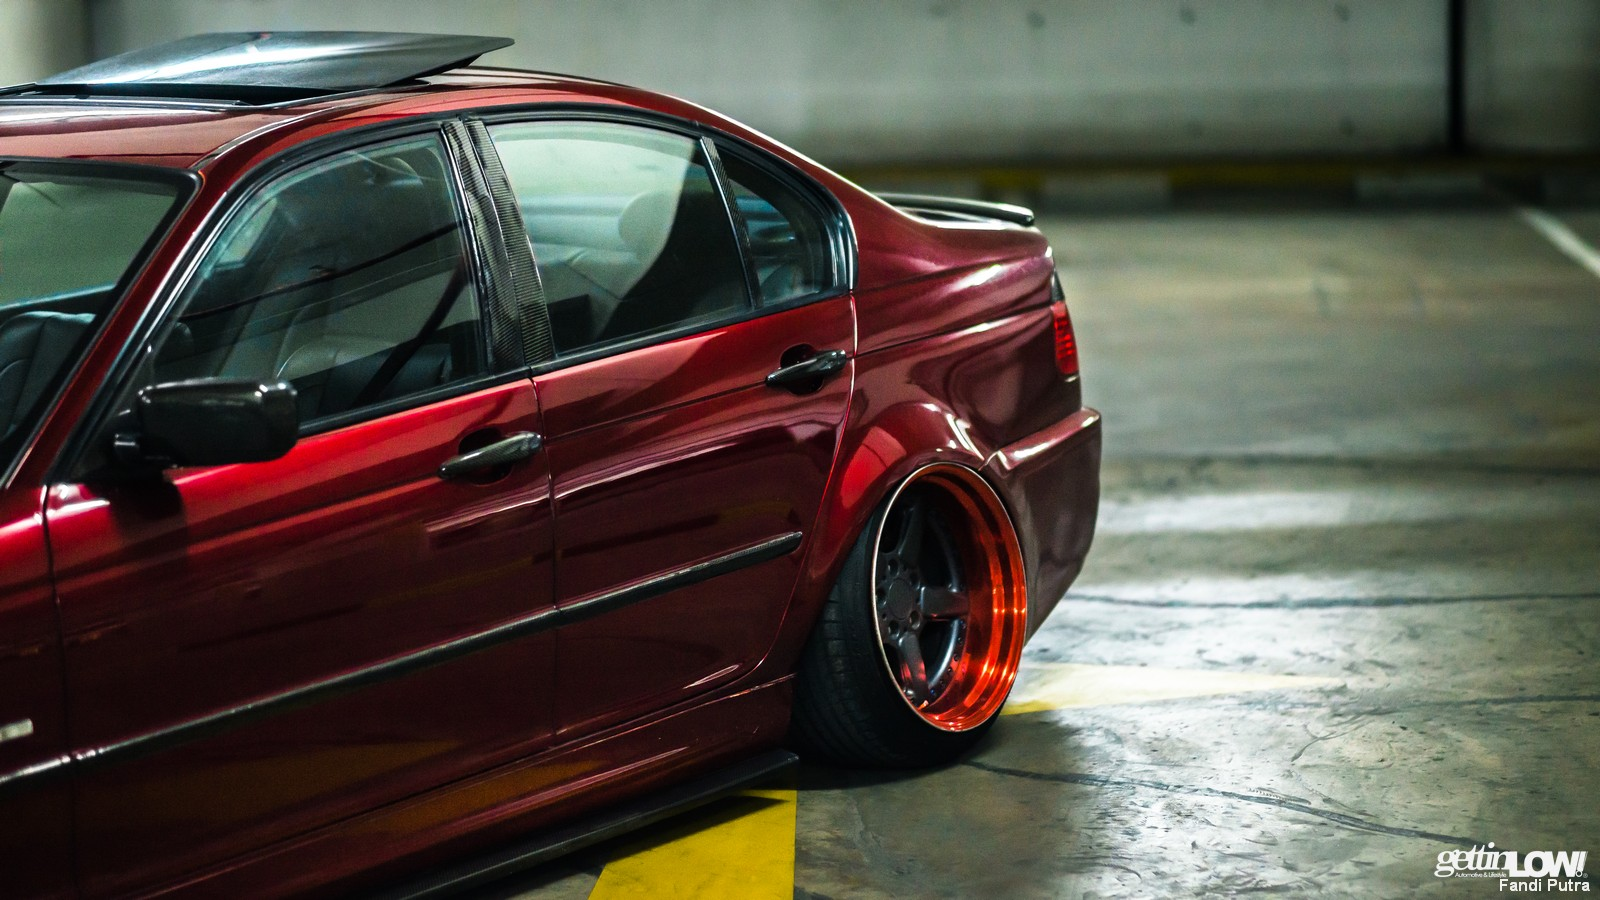 BMW-Maroon-gesrex_11